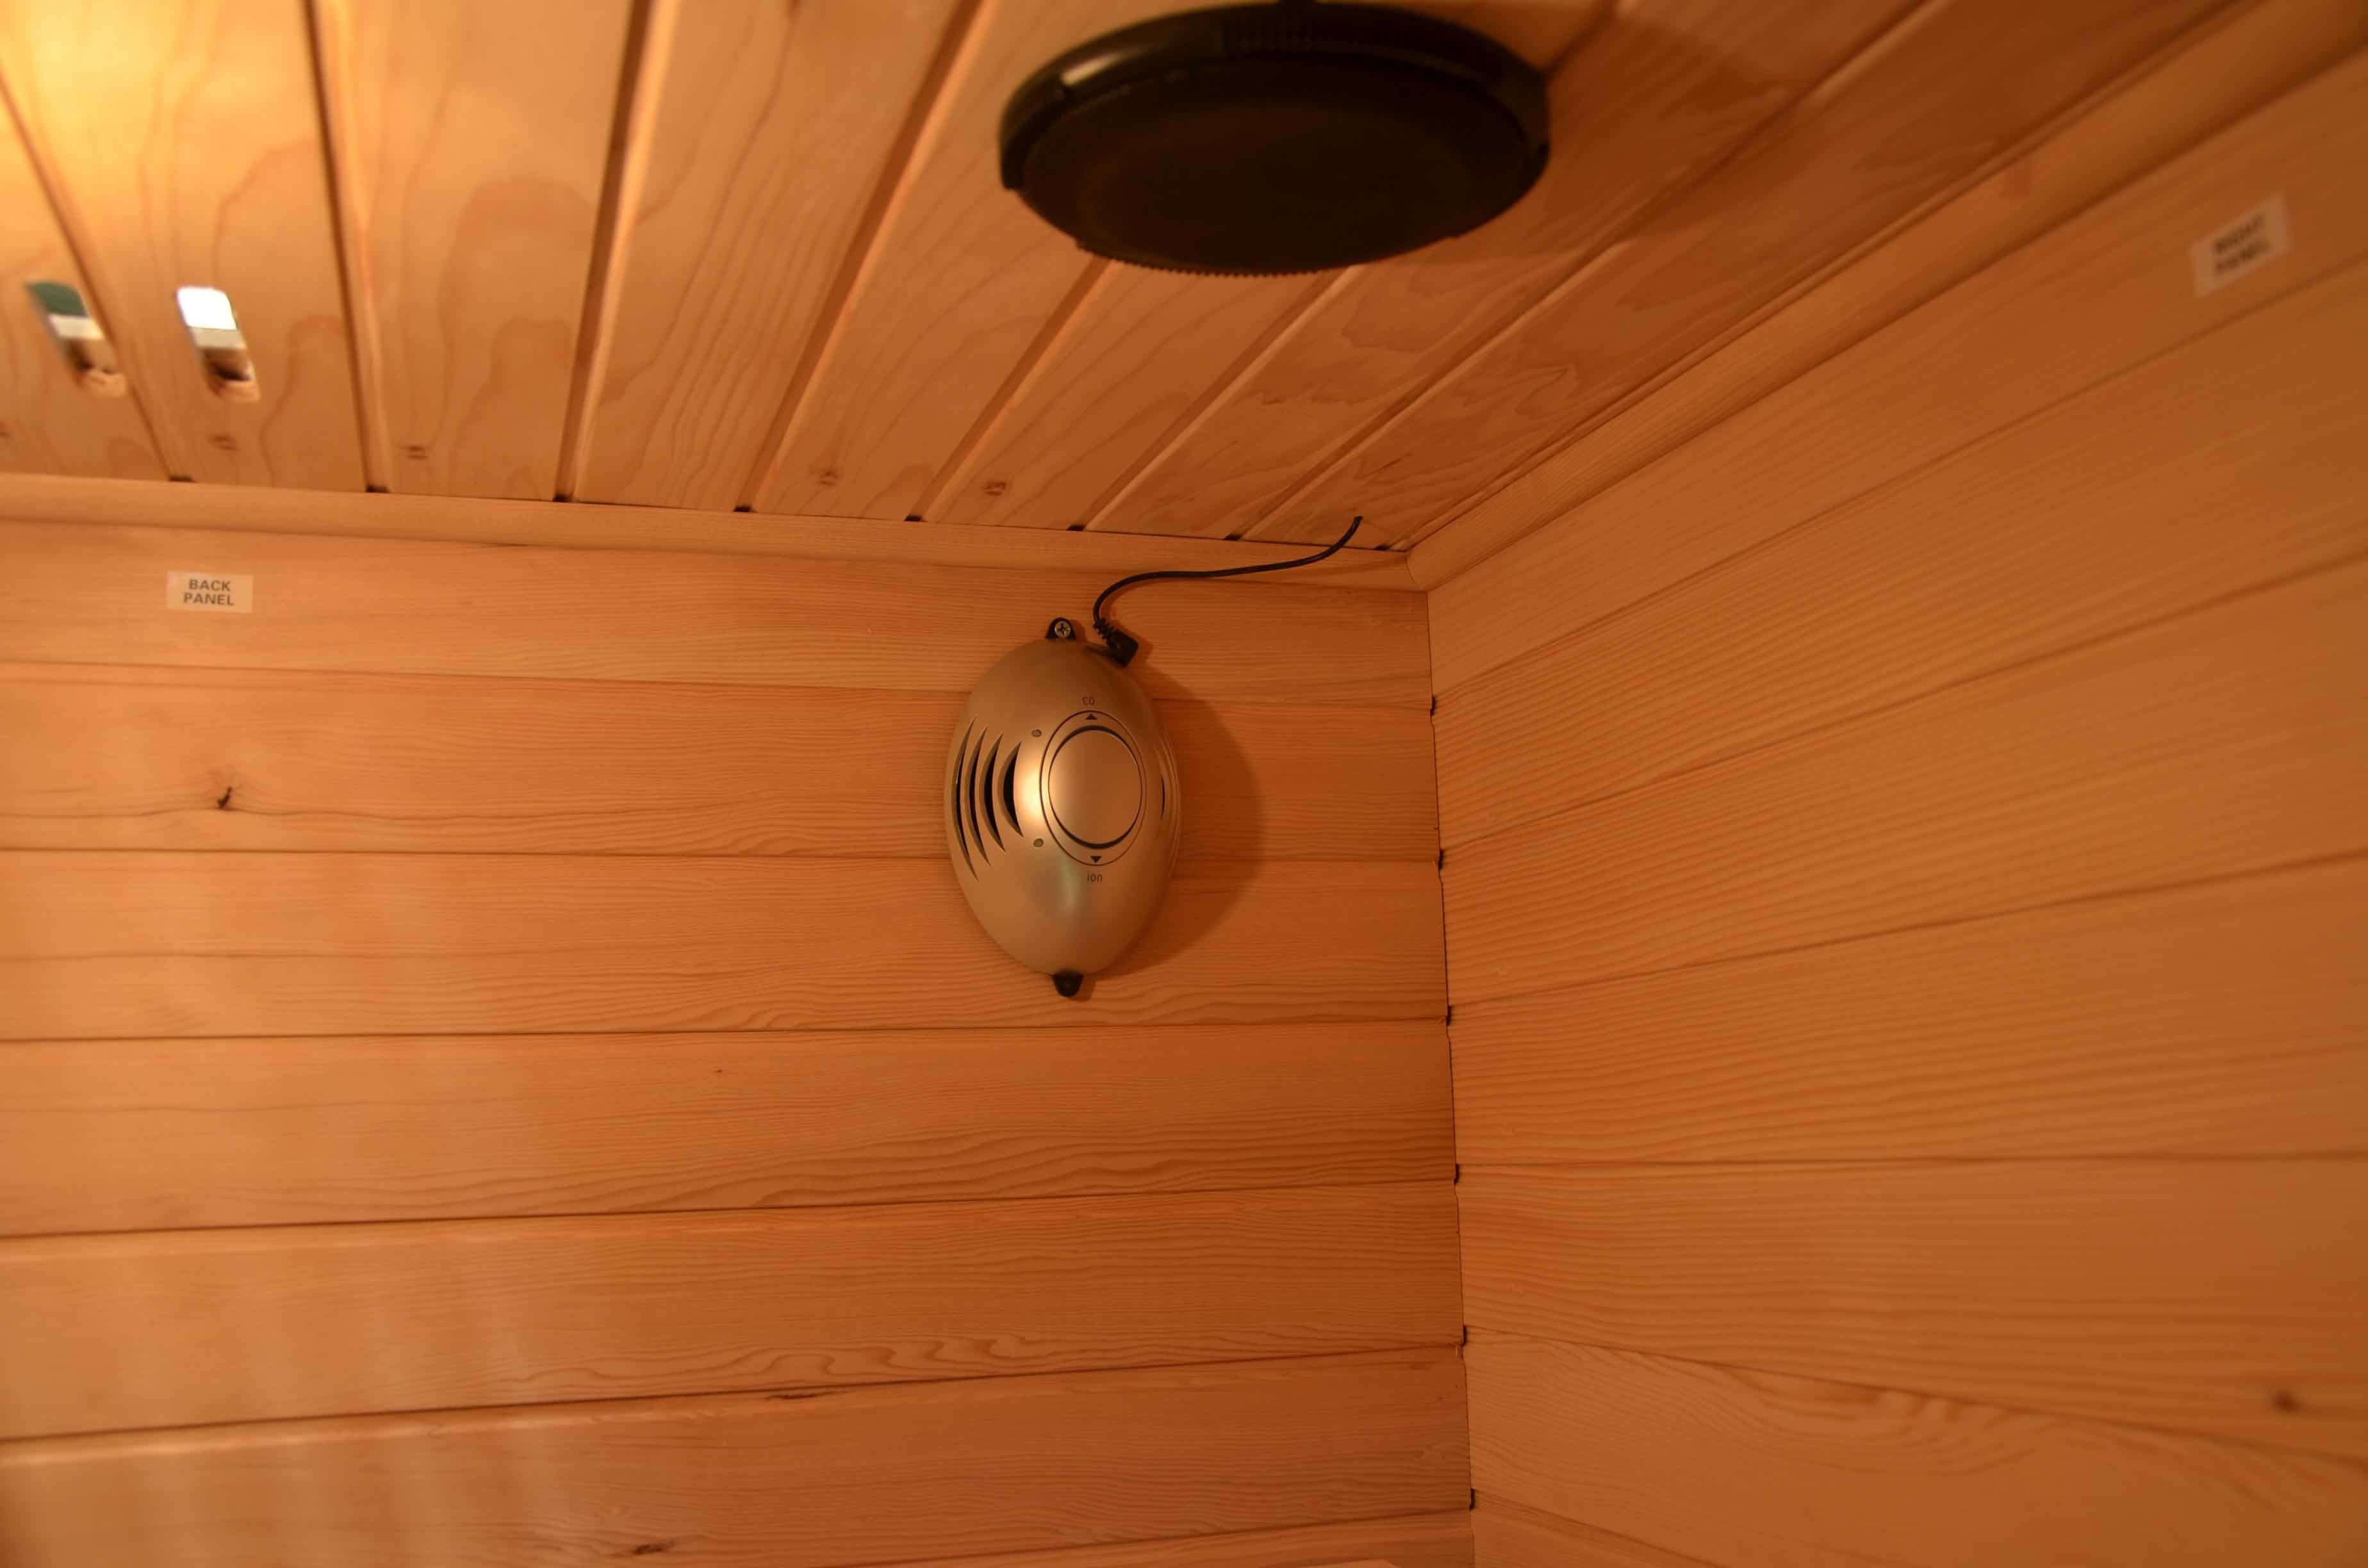 2016 Far Infrared Sauna Room Portable Wood Sauna for 1 People (SEK-C1)